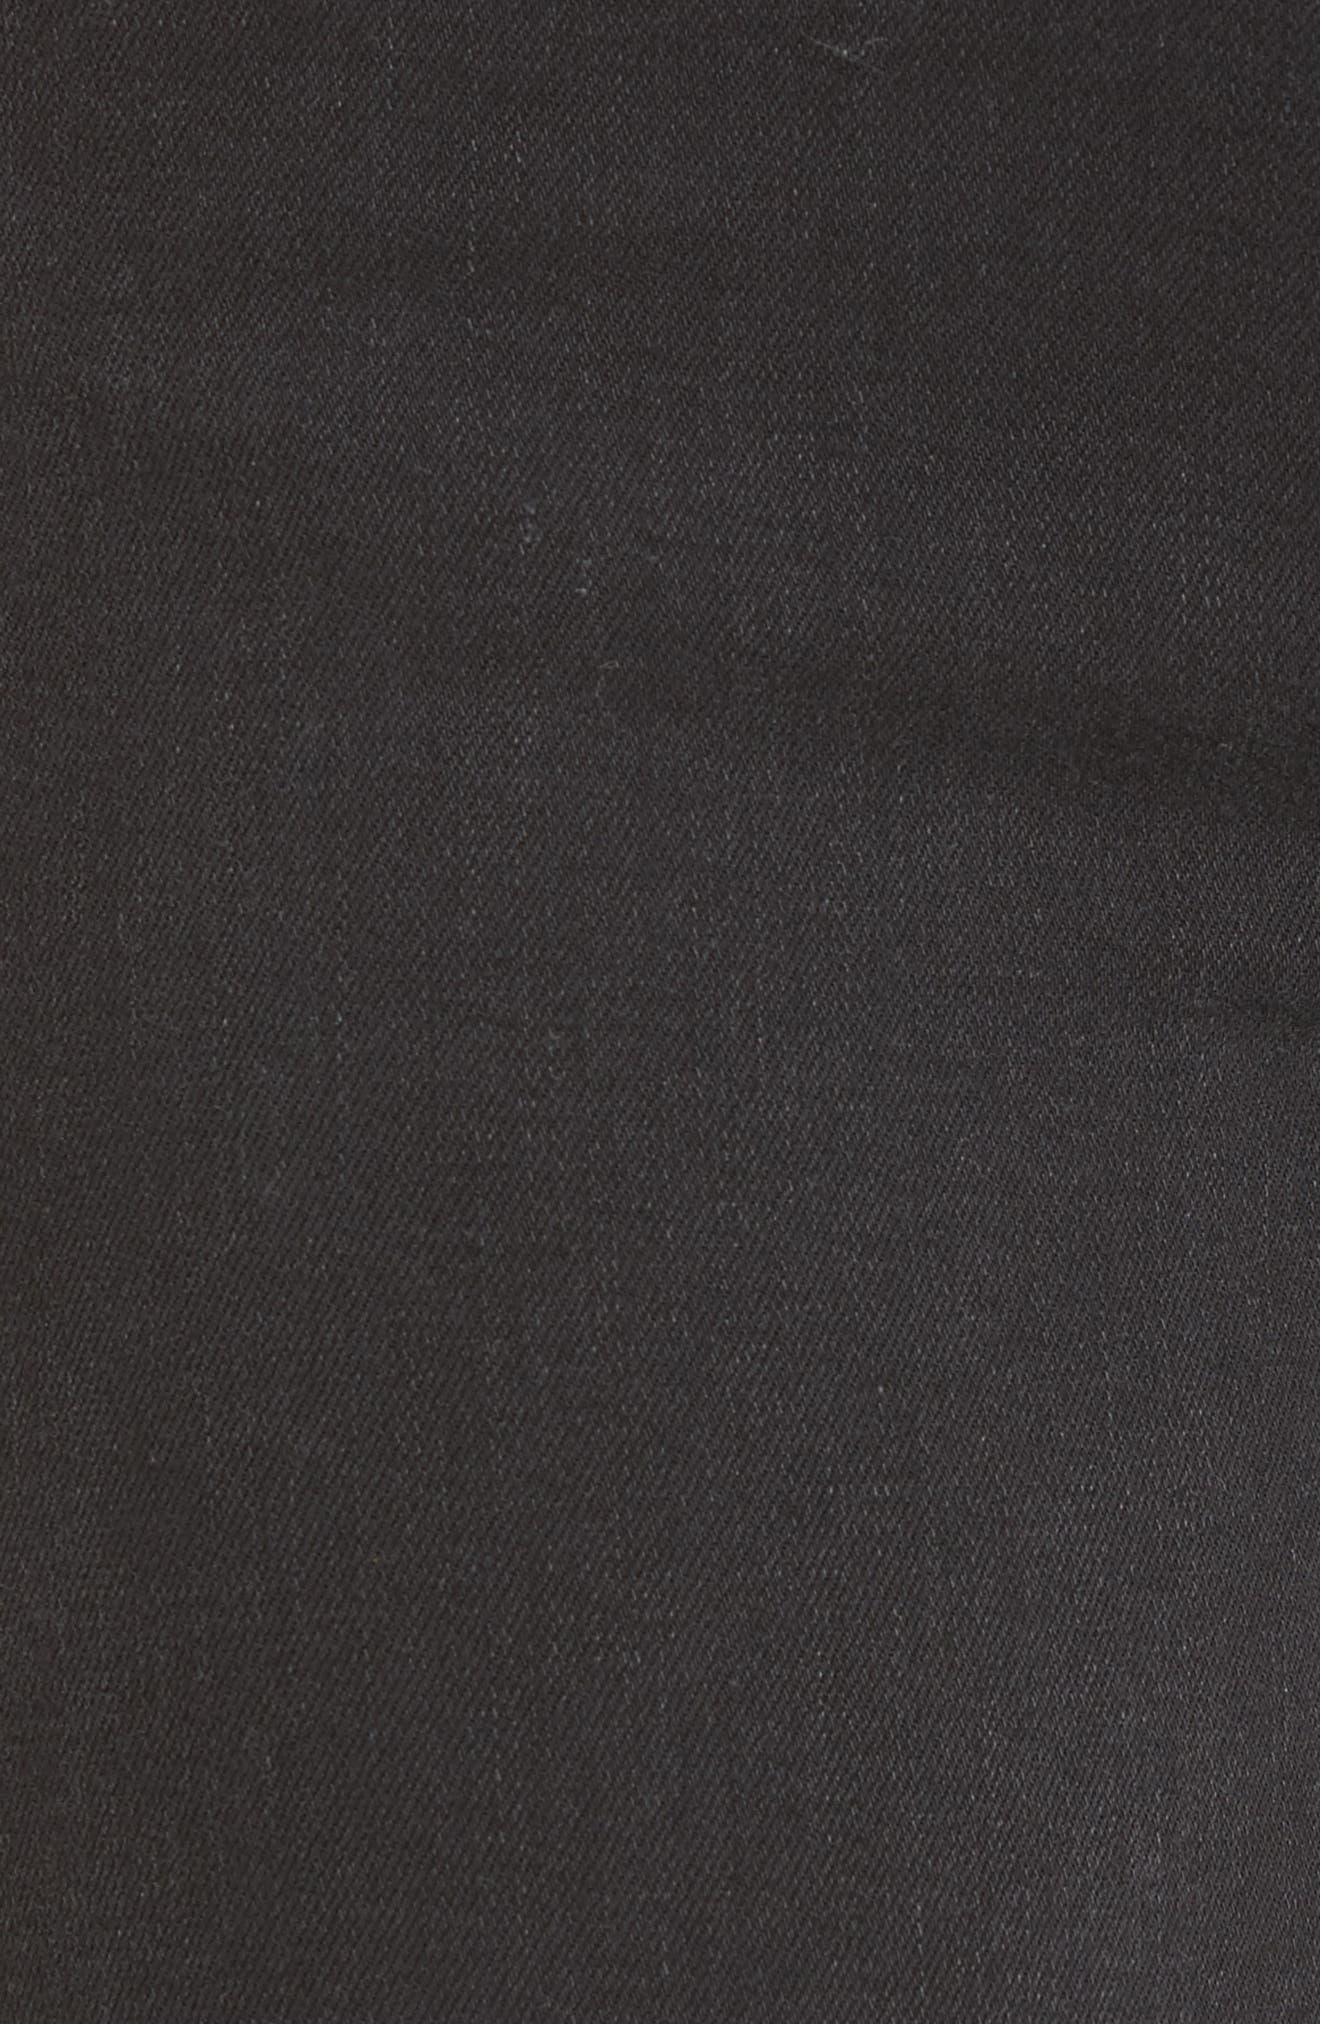 Transcend - Verdugo Ankle Skinny Jeans,                             Alternate thumbnail 6, color,                             Black Fog Super Distressed